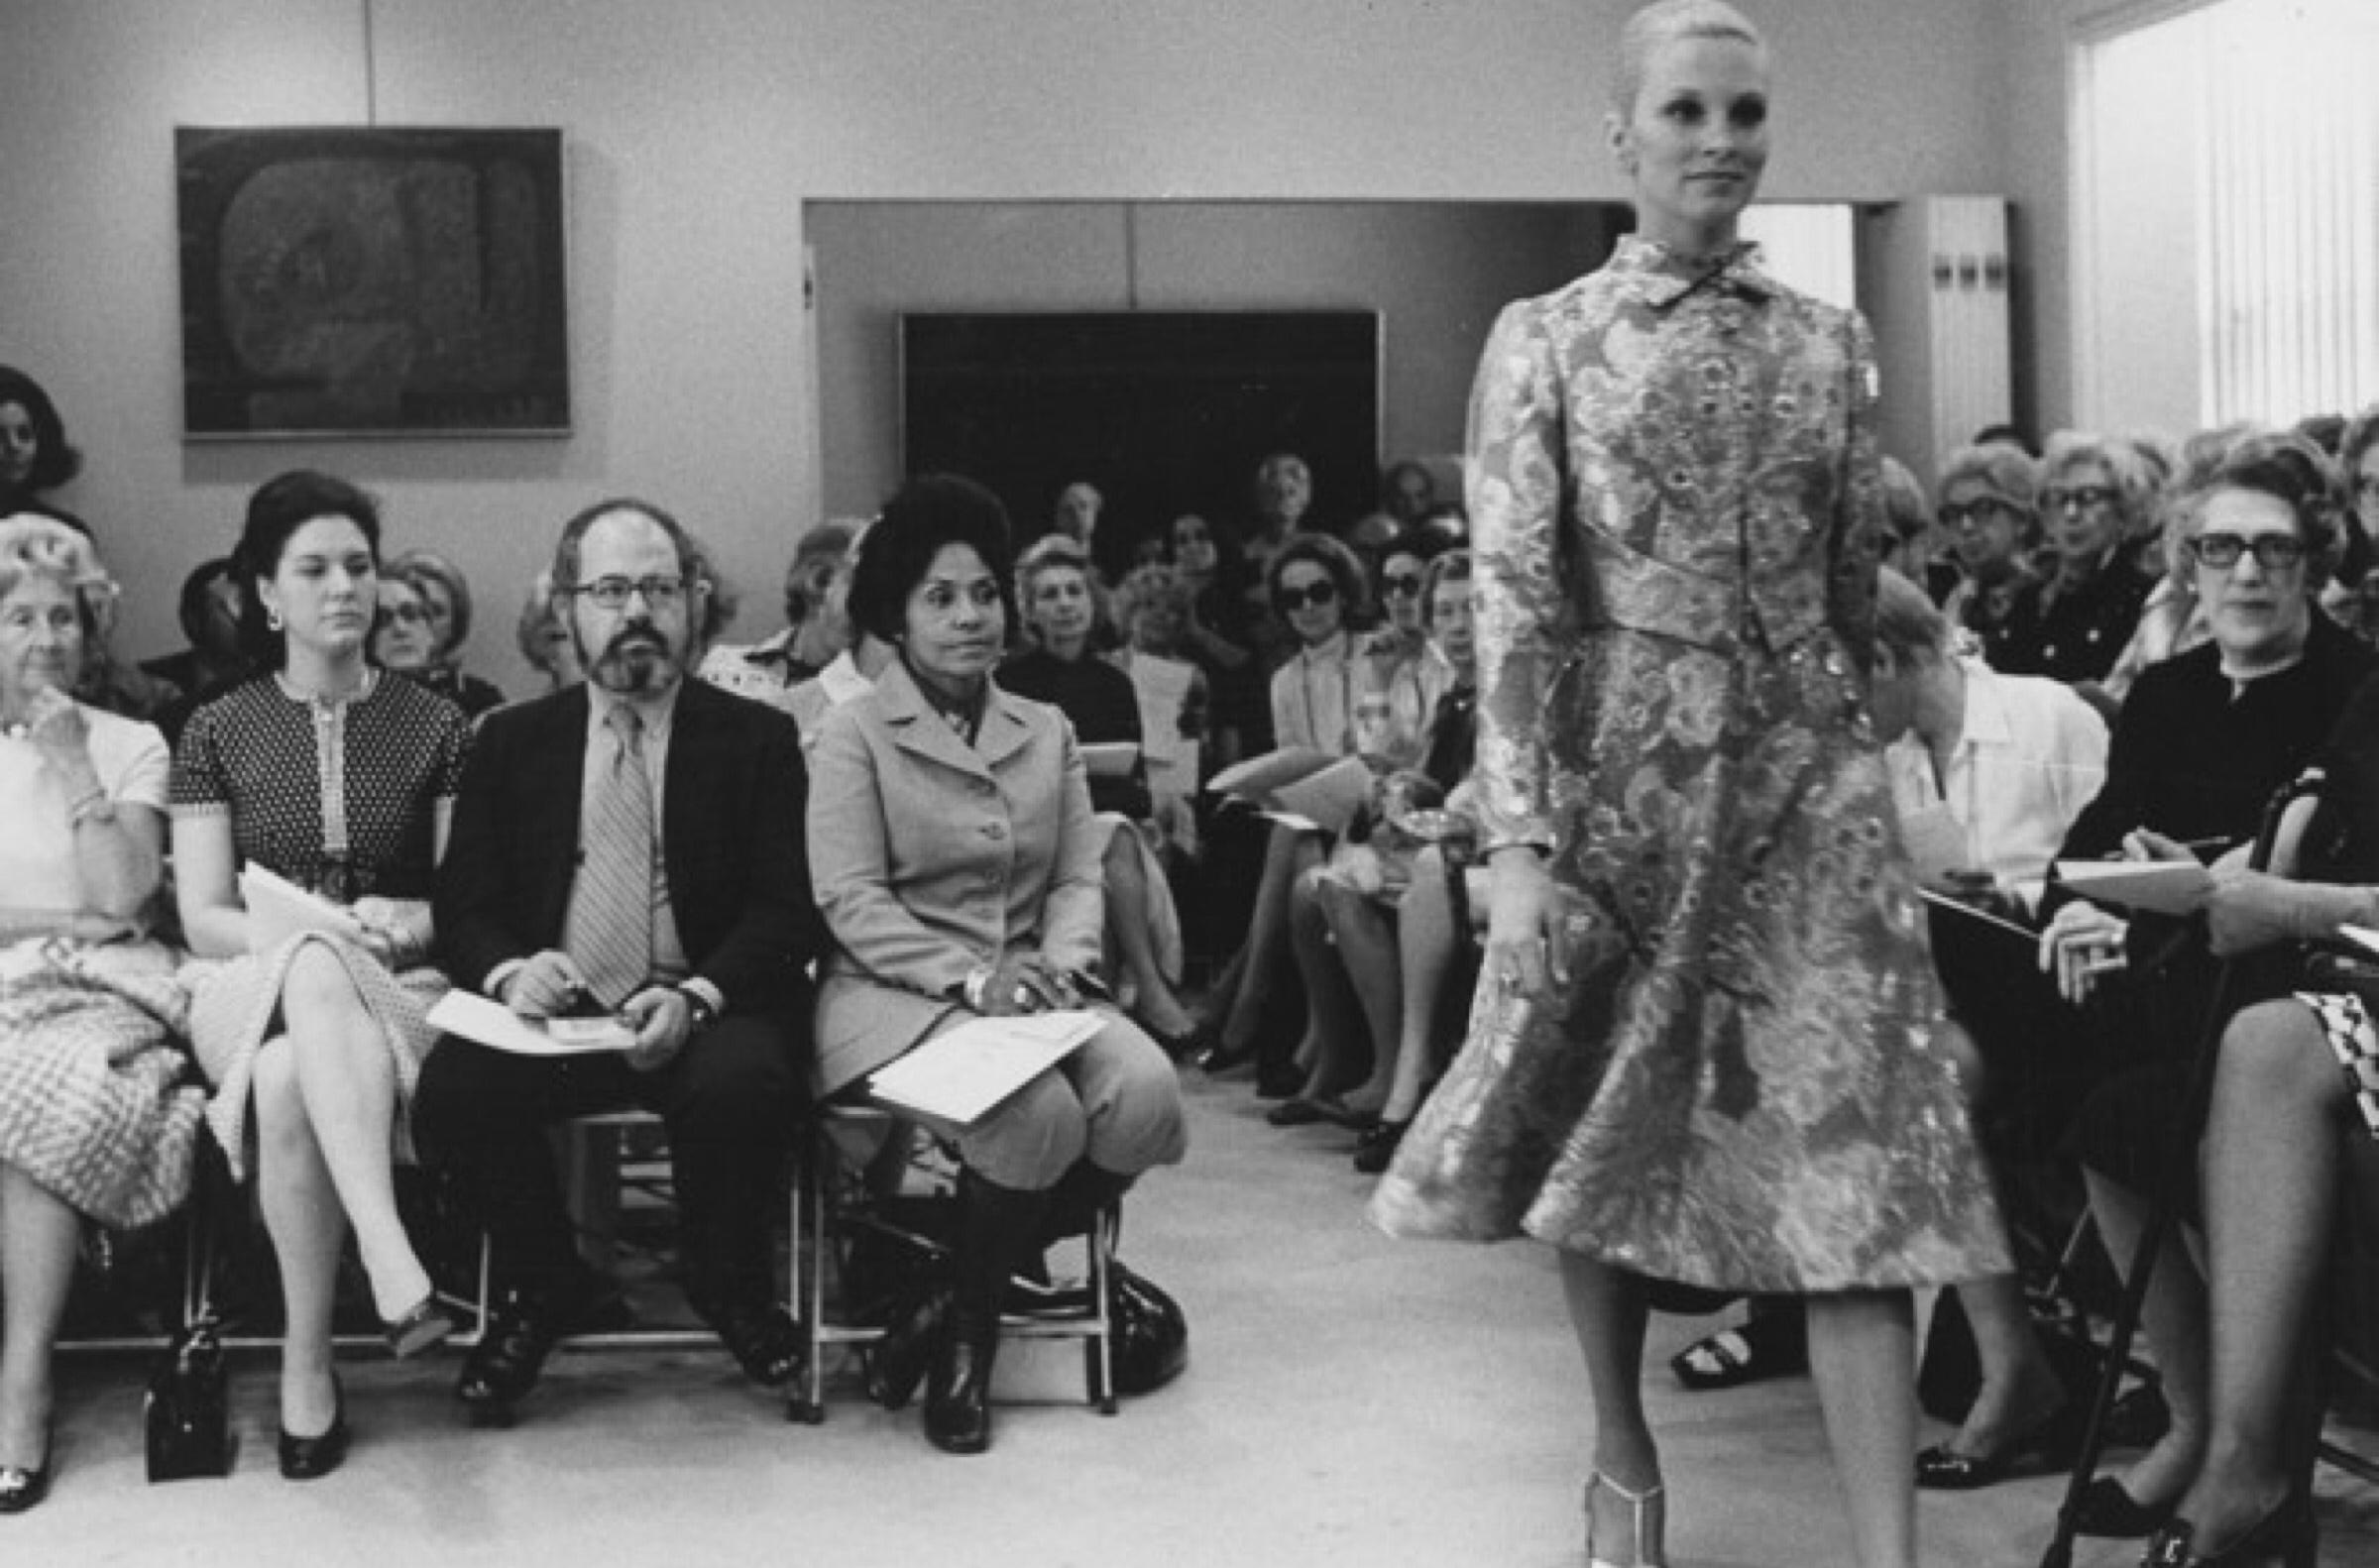 Pioneer and Curator of Ebony Fashion Fair, Eunice Walker Johnson sitting front row during a fashion presentation.